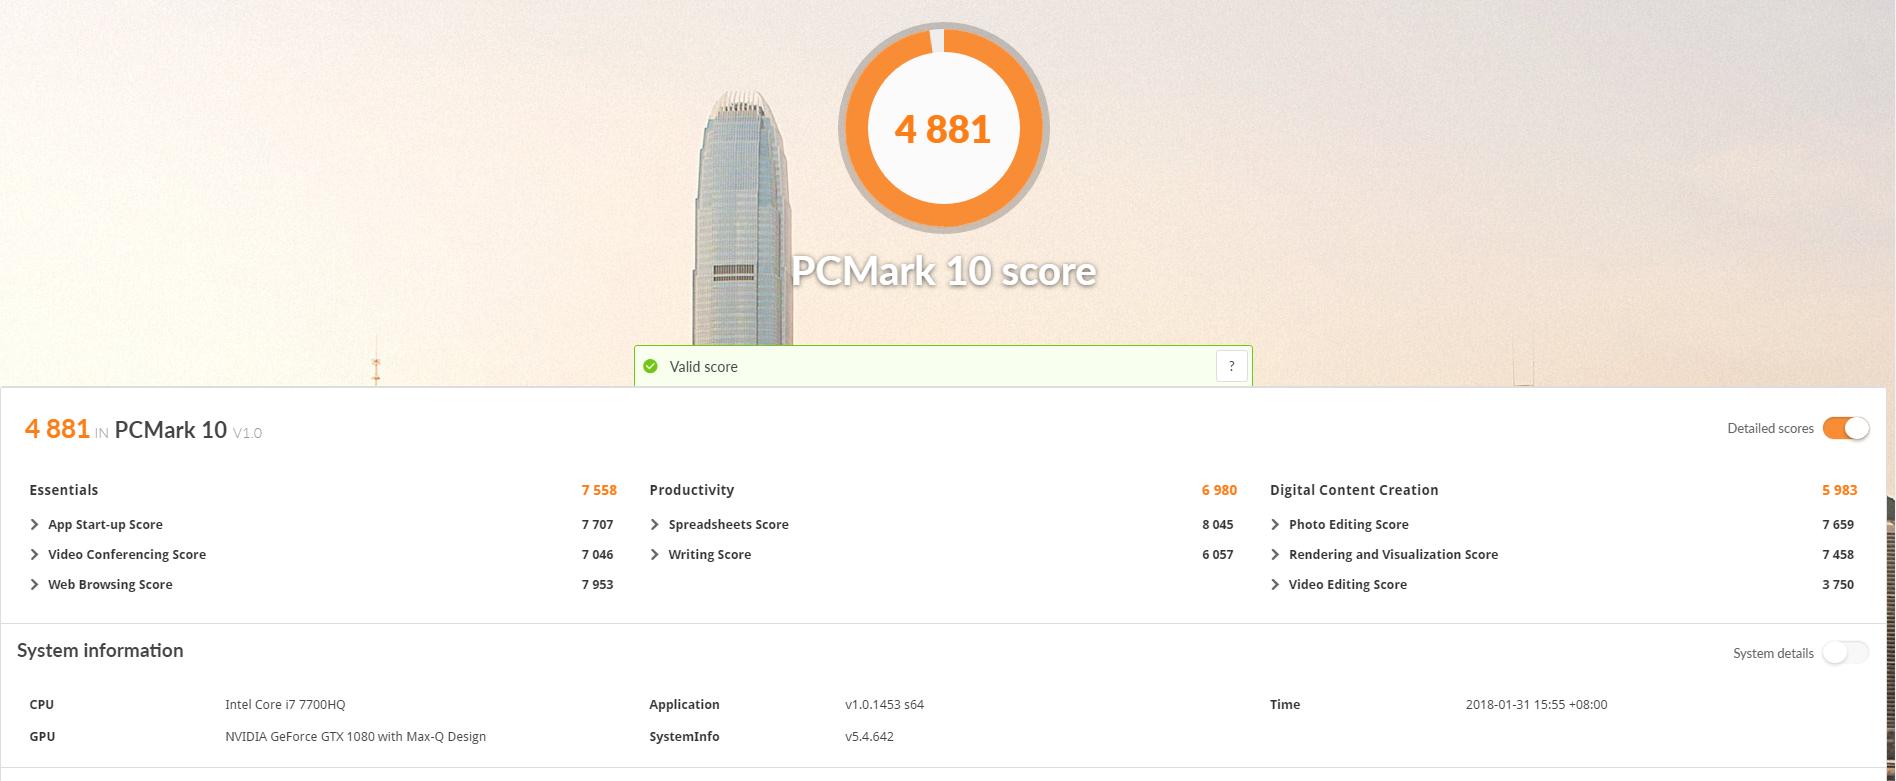 宏碁 掠夺者 Acer Predator Triton 700 评测